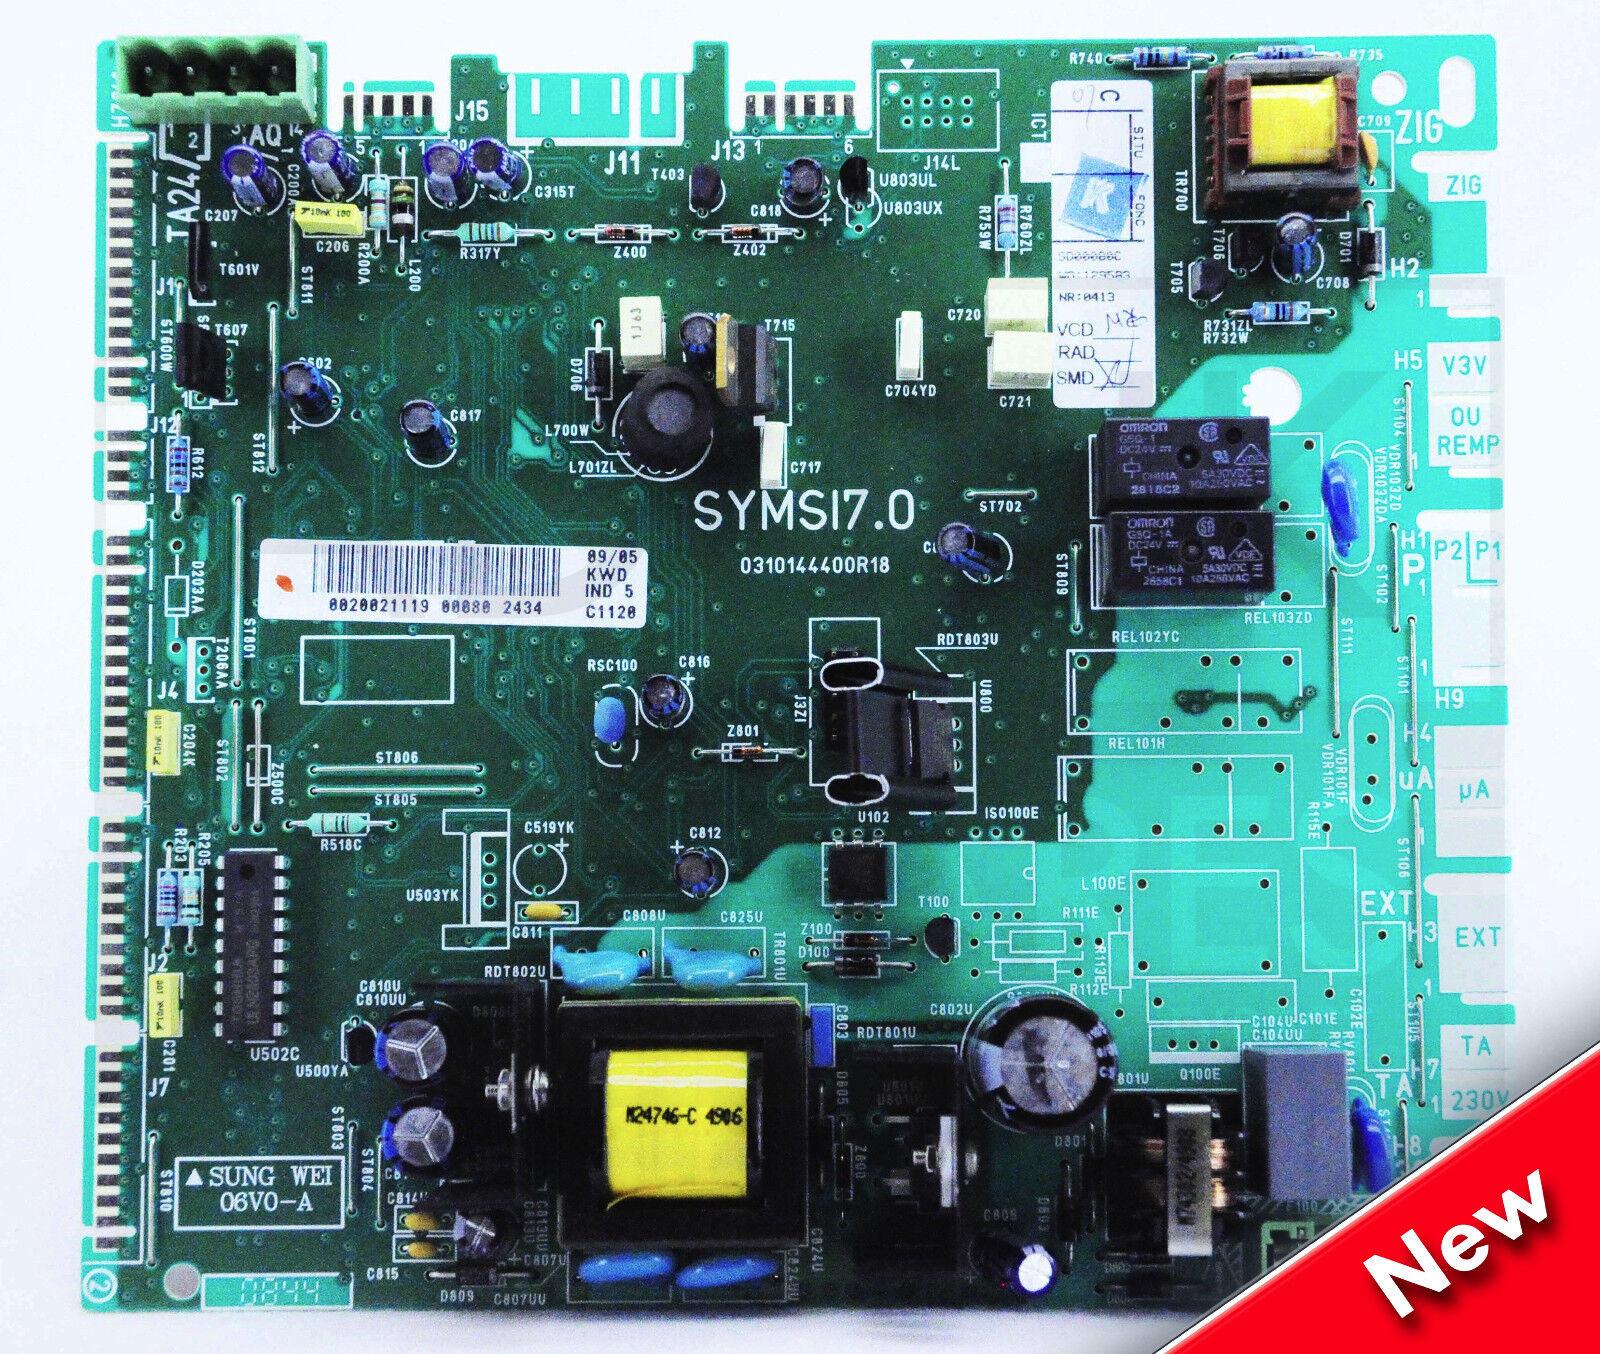 GLOWWORM 24CXI 30CXI 38CXI PRINTED CIRCUIT BOARD PCB 2000802731 ...